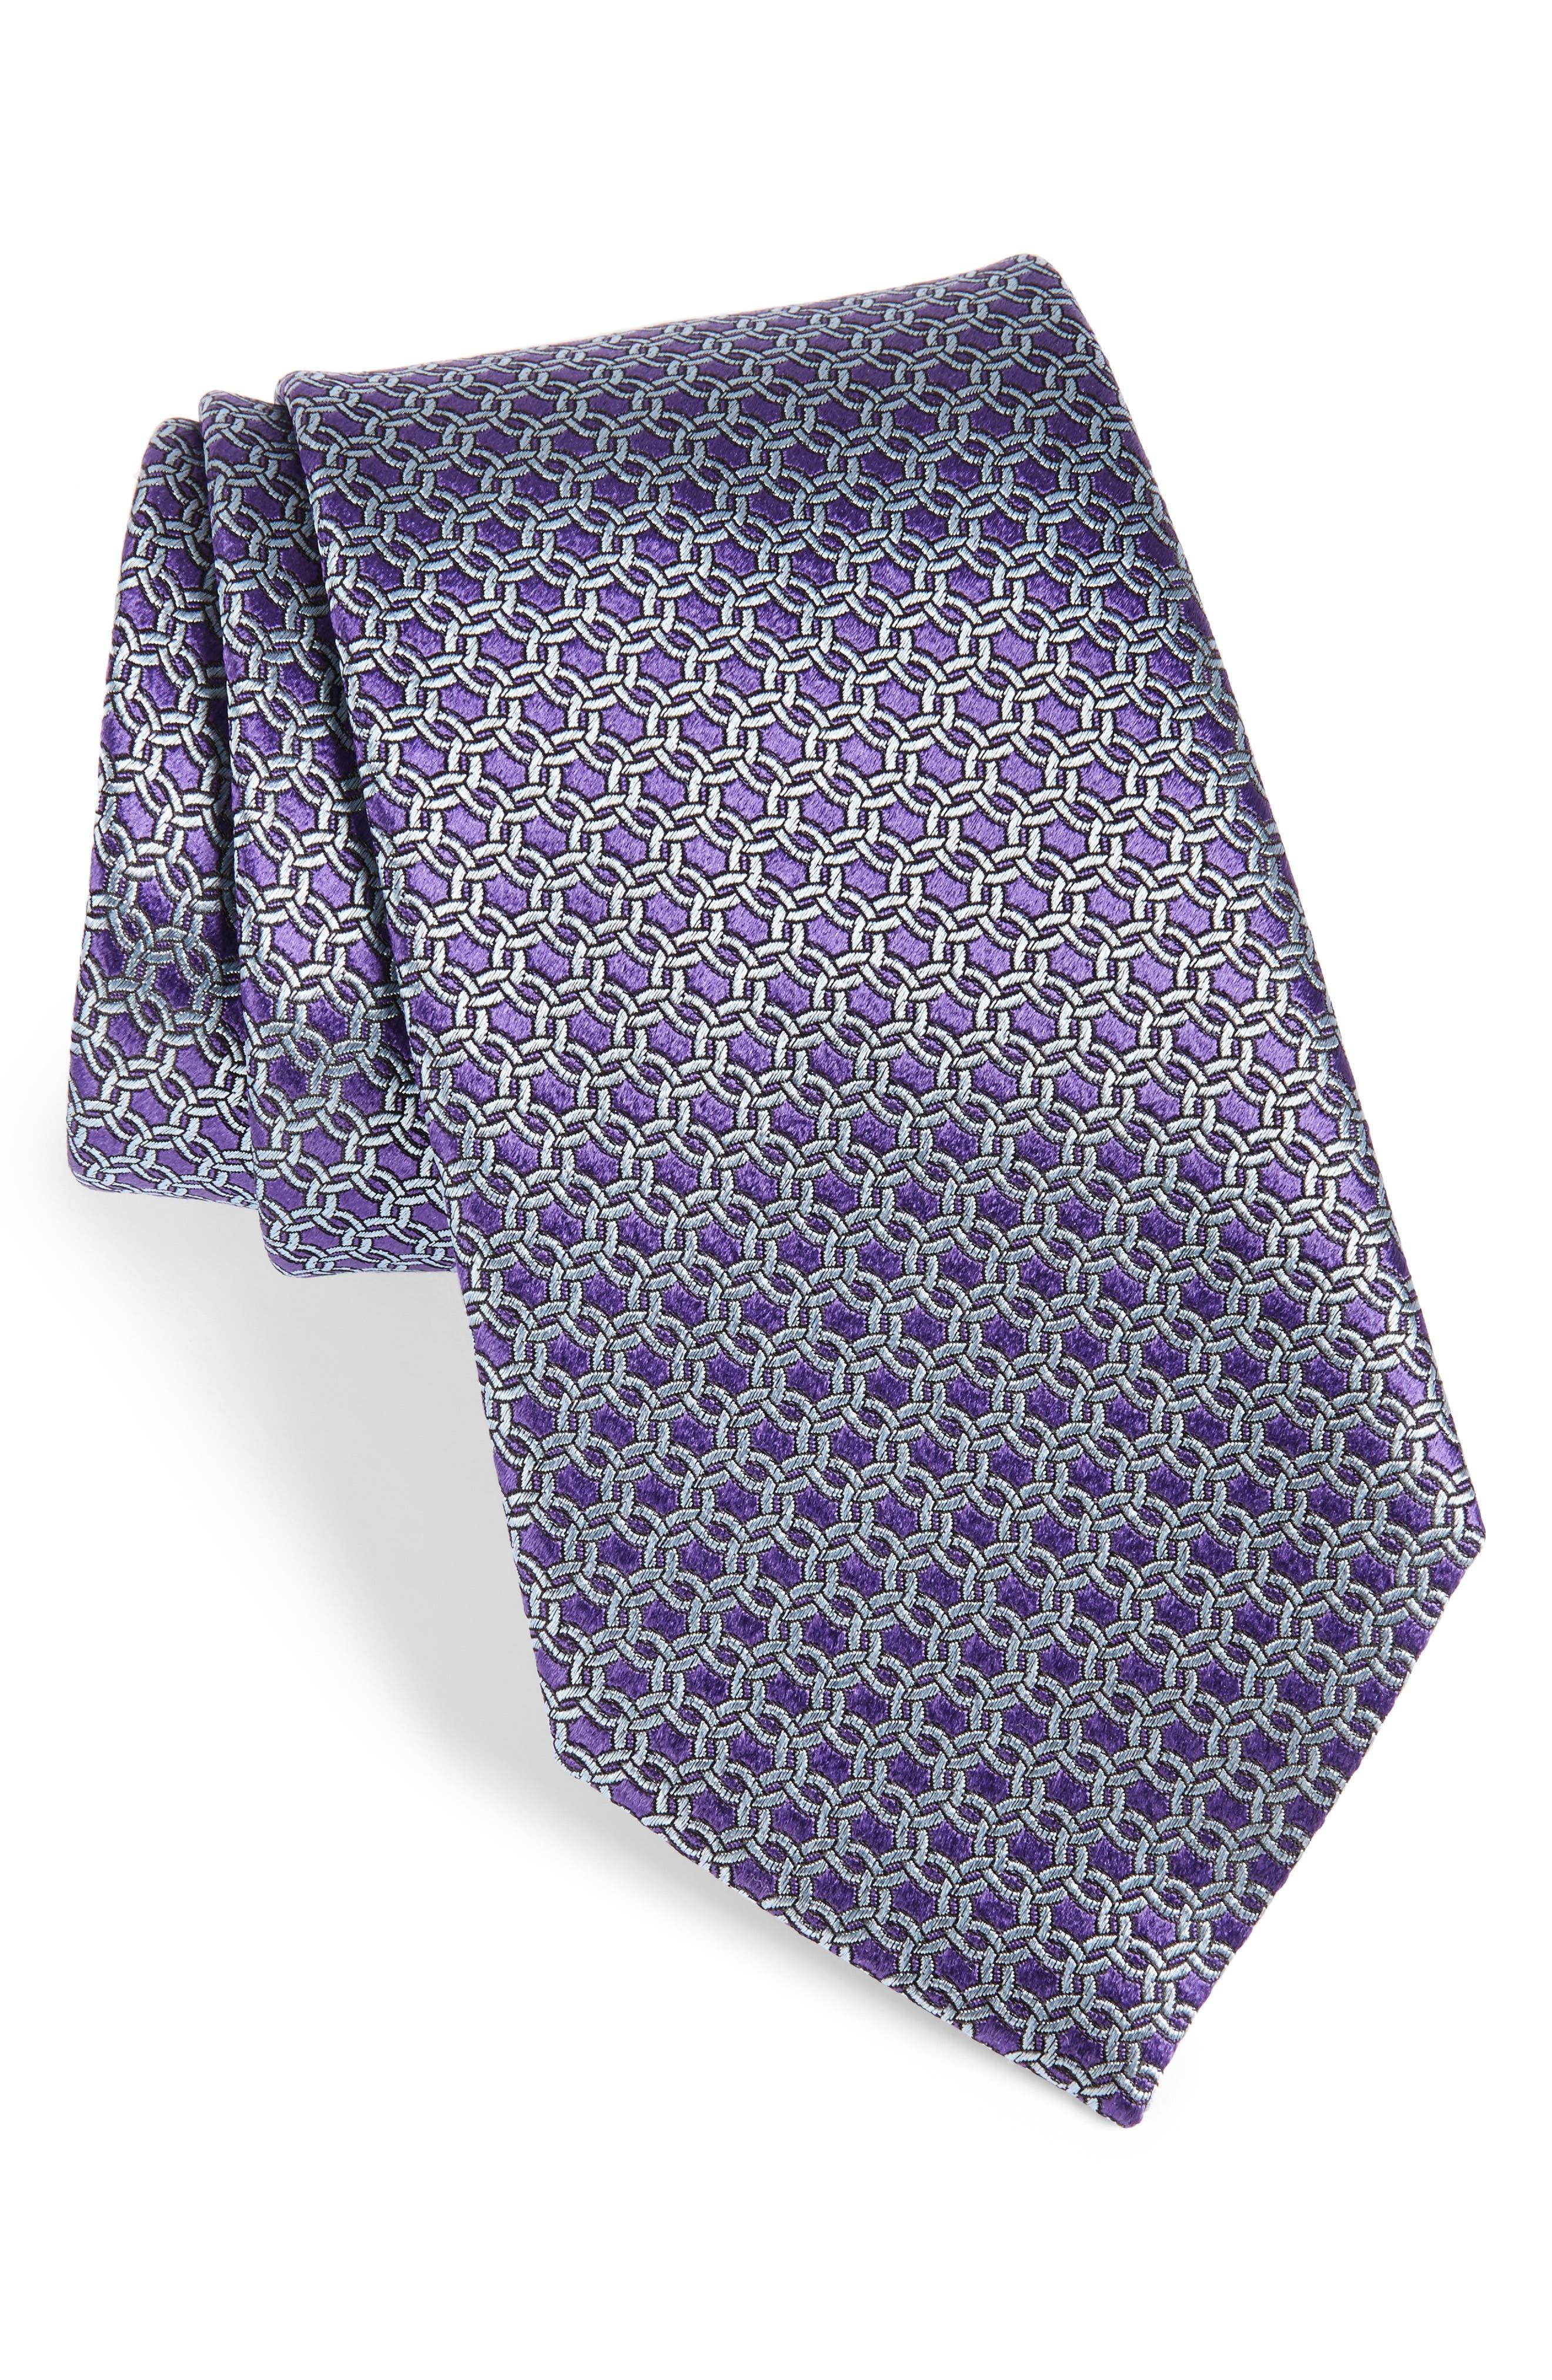 ERMENEGILDO ZEGNA Geometric Silk Tie, Main, color, 512